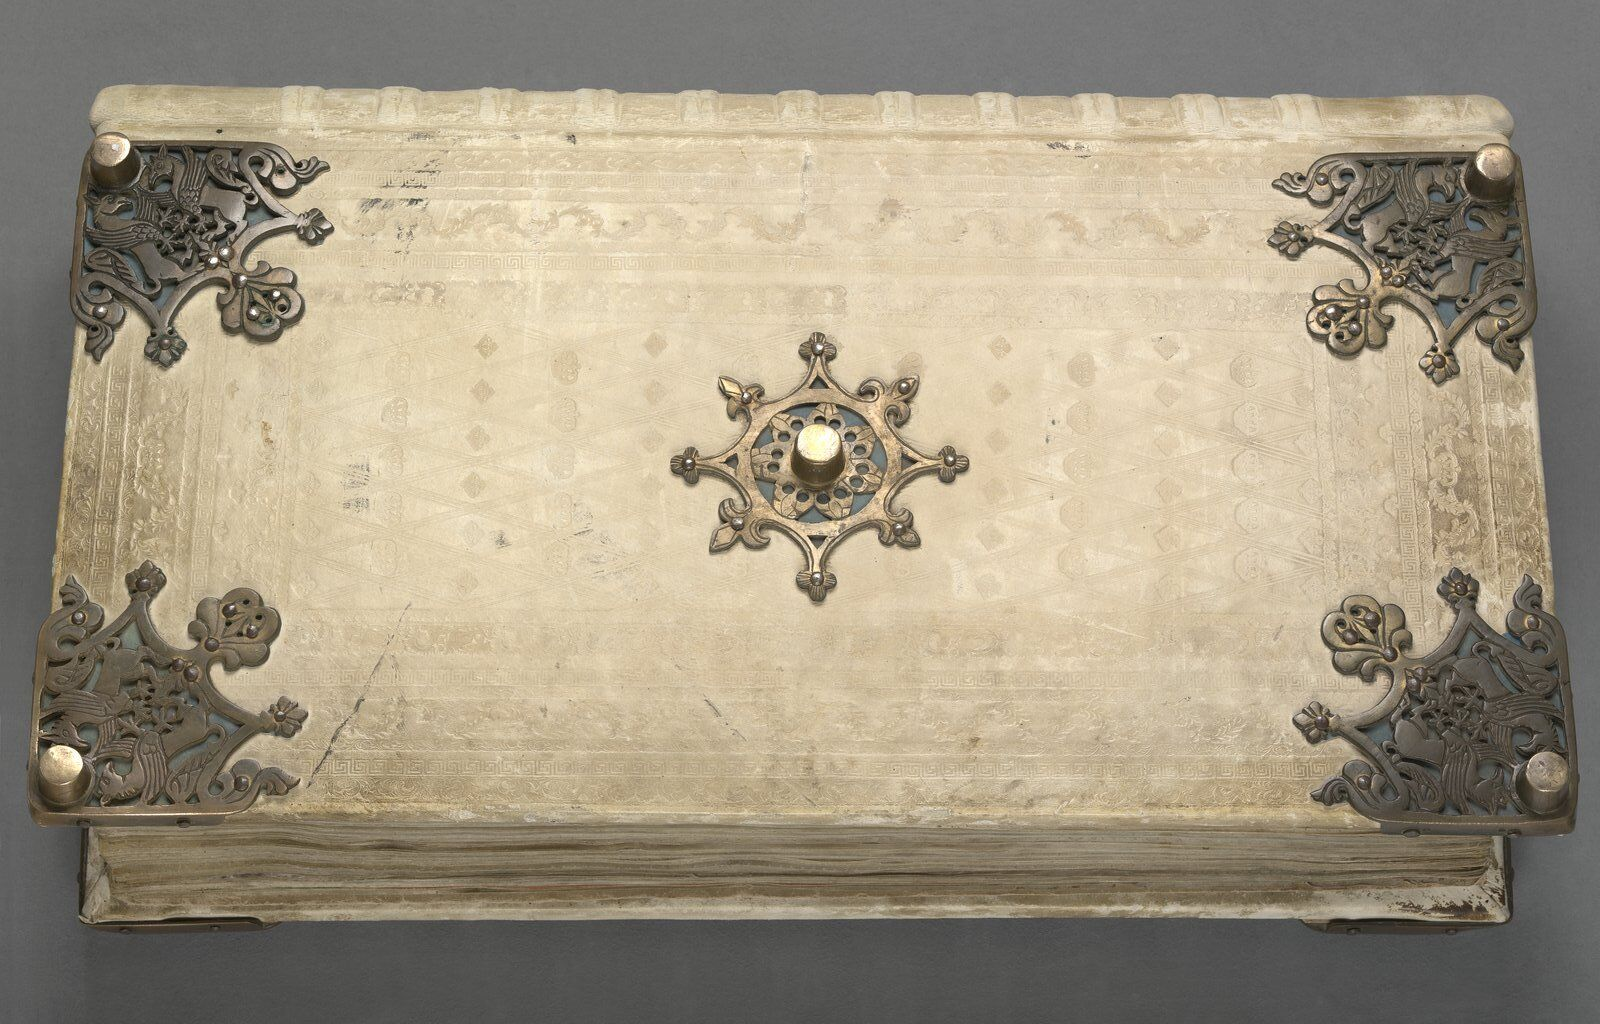 Five metal plates decorate the Devil's Bible.